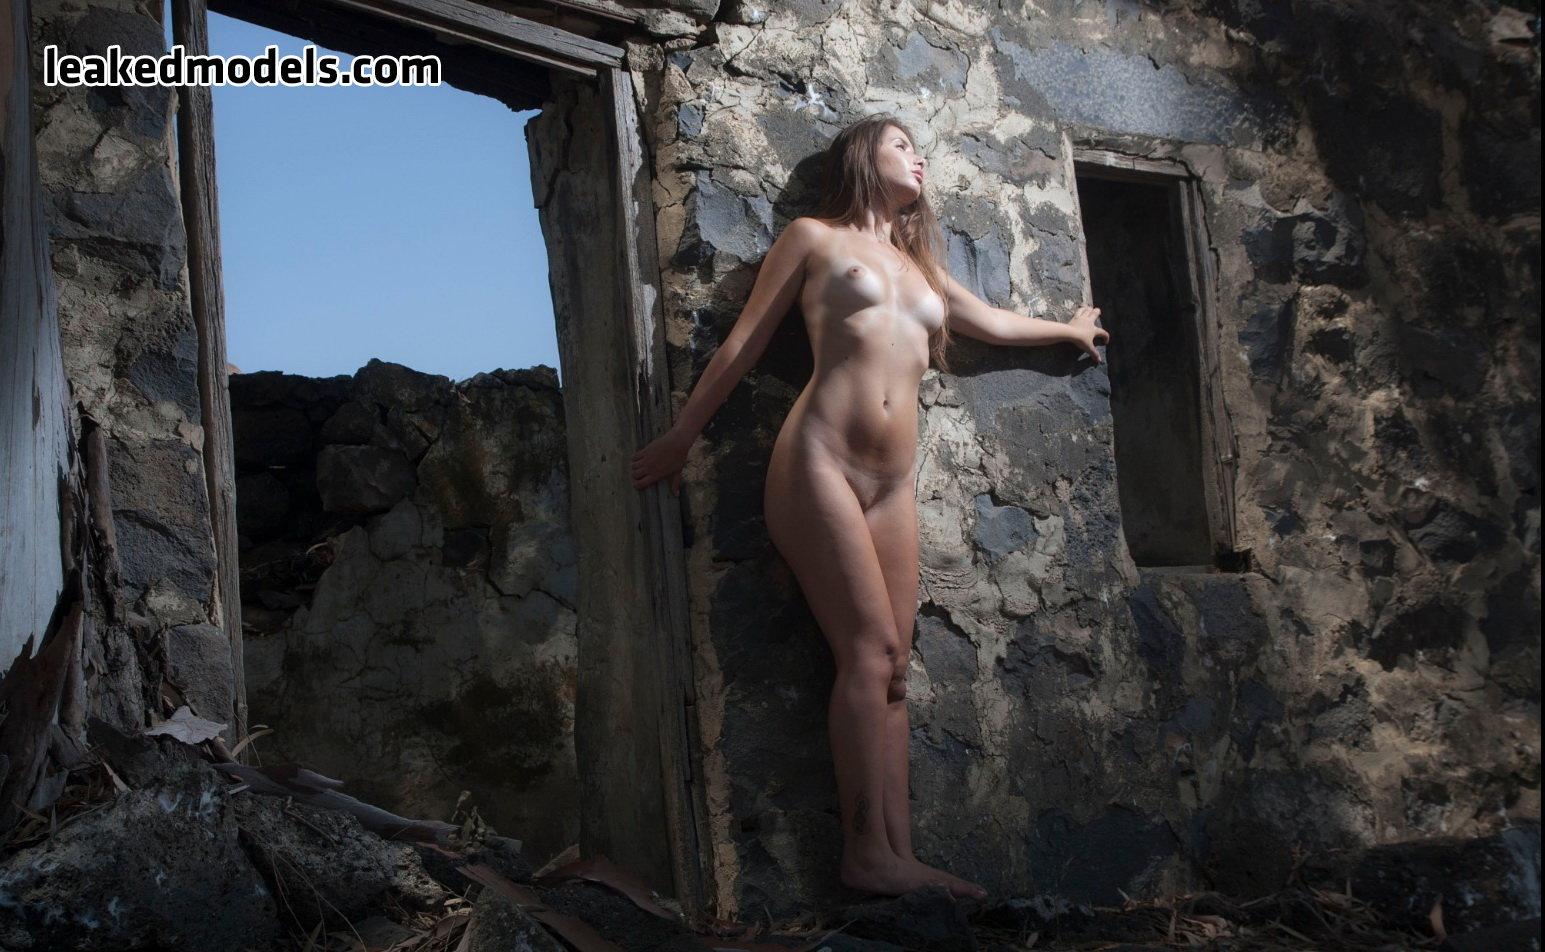 Almog Fink – almogfink Instagram Nude Leaks (30 Photos)